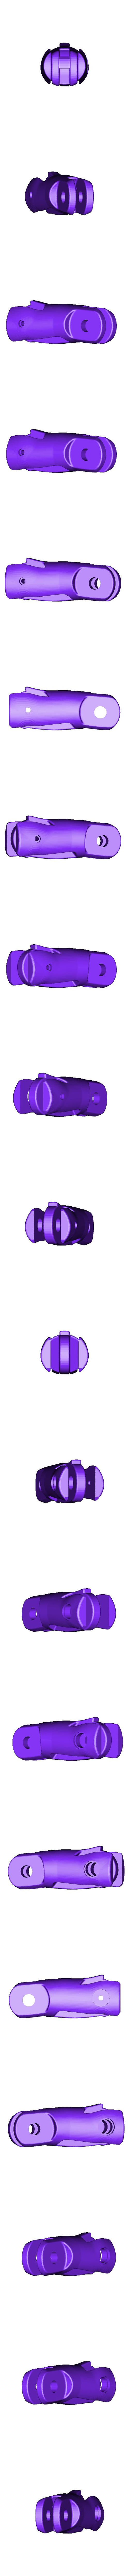 annulaire_-_phalangine.stl Download free STL file Articulated hand • 3D printer model, NOP21